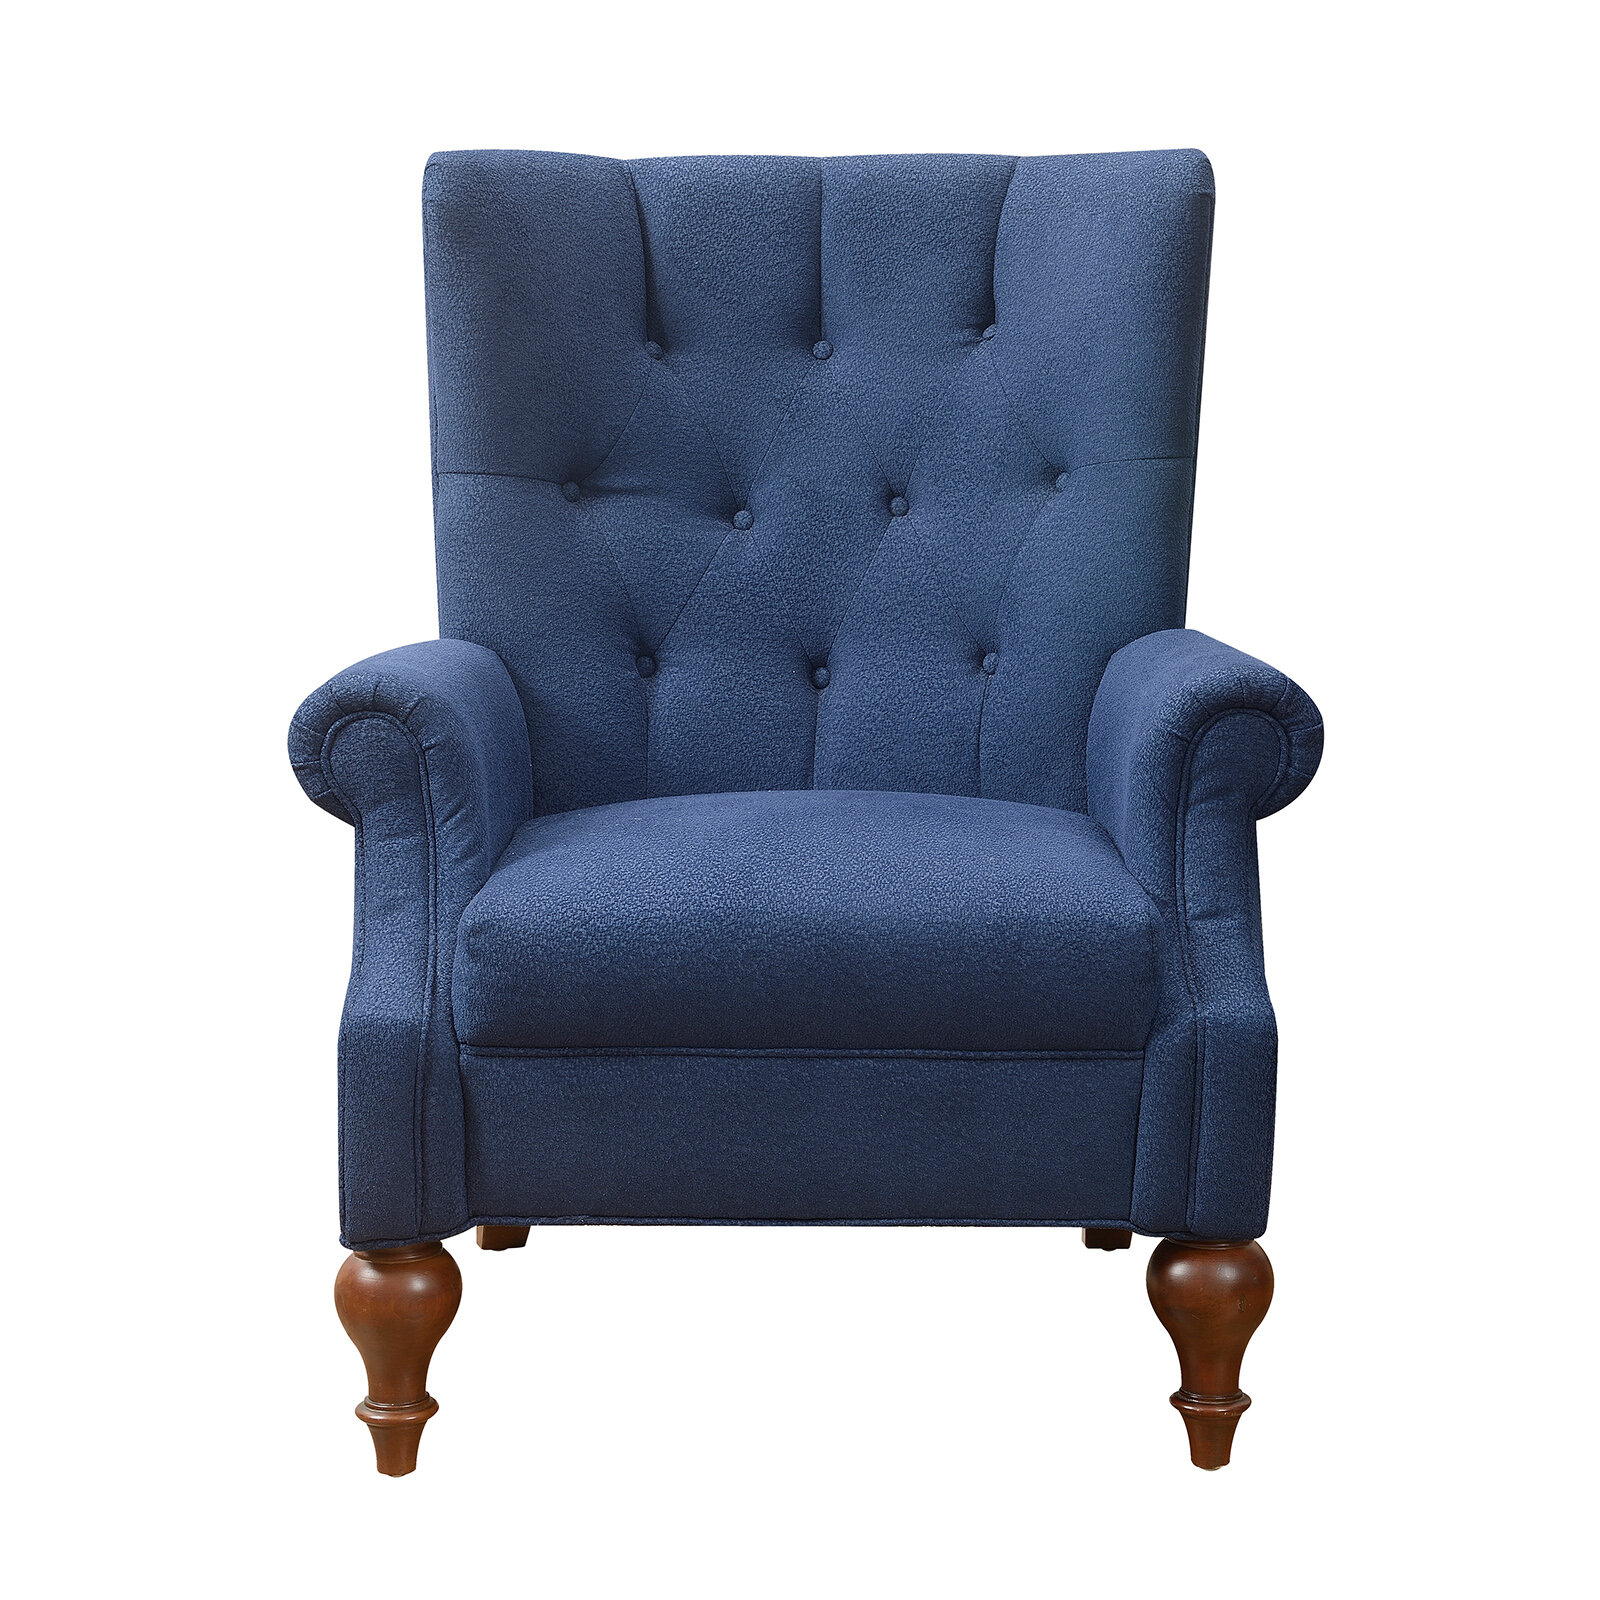 Remarkable Devan Wingback Chair Download Free Architecture Designs Grimeyleaguecom